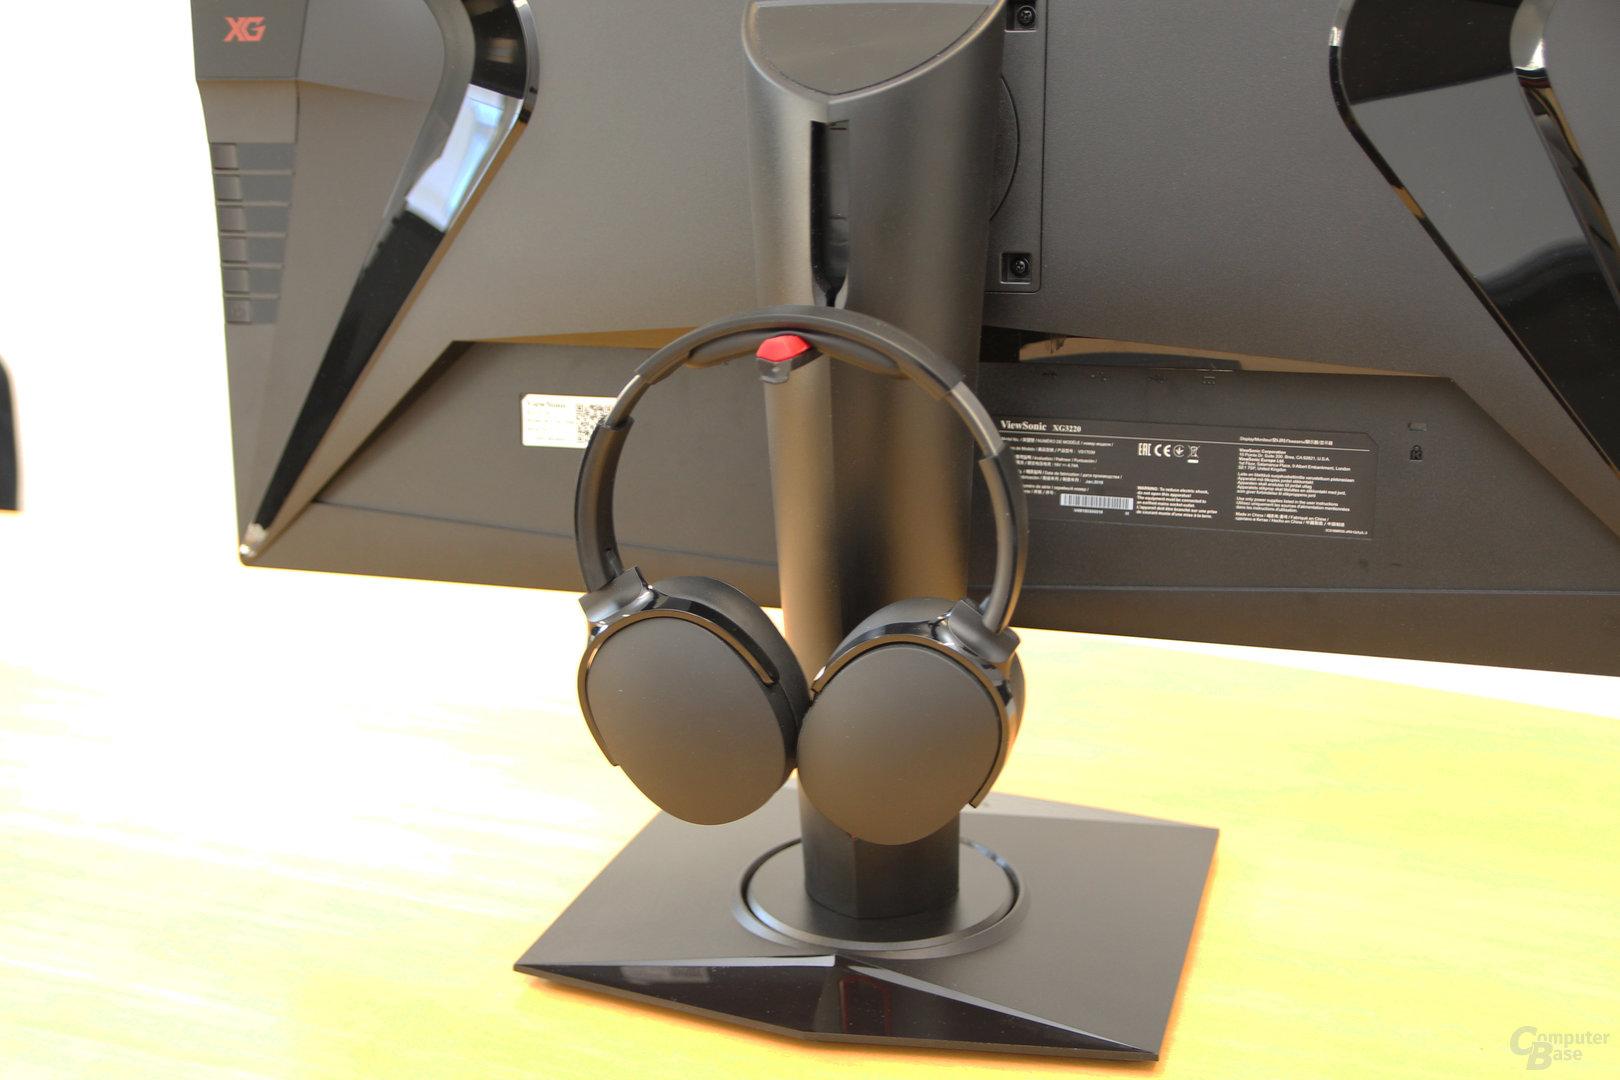 ViewSonic XG3220 – Headset-Halter am Standfuß